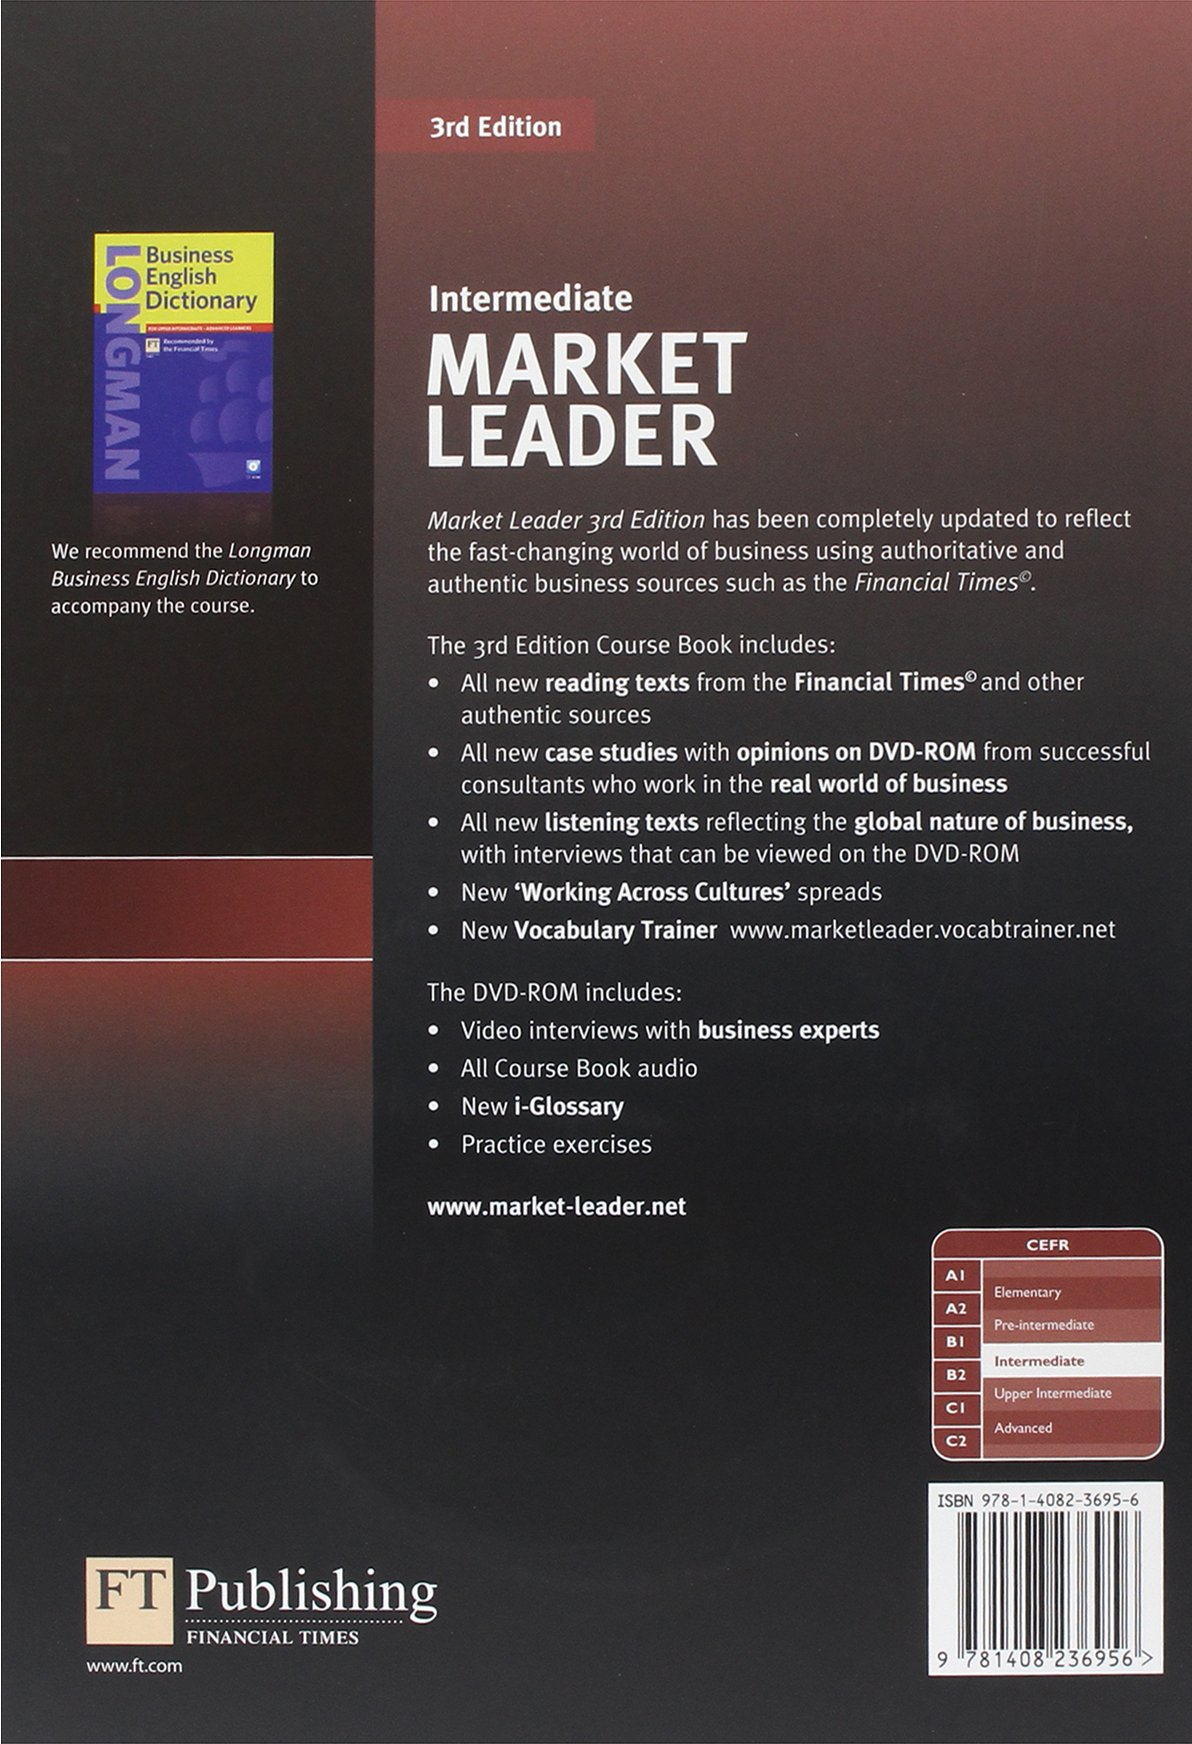 Market leader 3rd edition intermediate coursebook dvd rom pack market leader 3rd edition intermediate coursebook dvd rom pack amazon mr david cotton mr david falvey simon kent 9781408236956 books fandeluxe Images